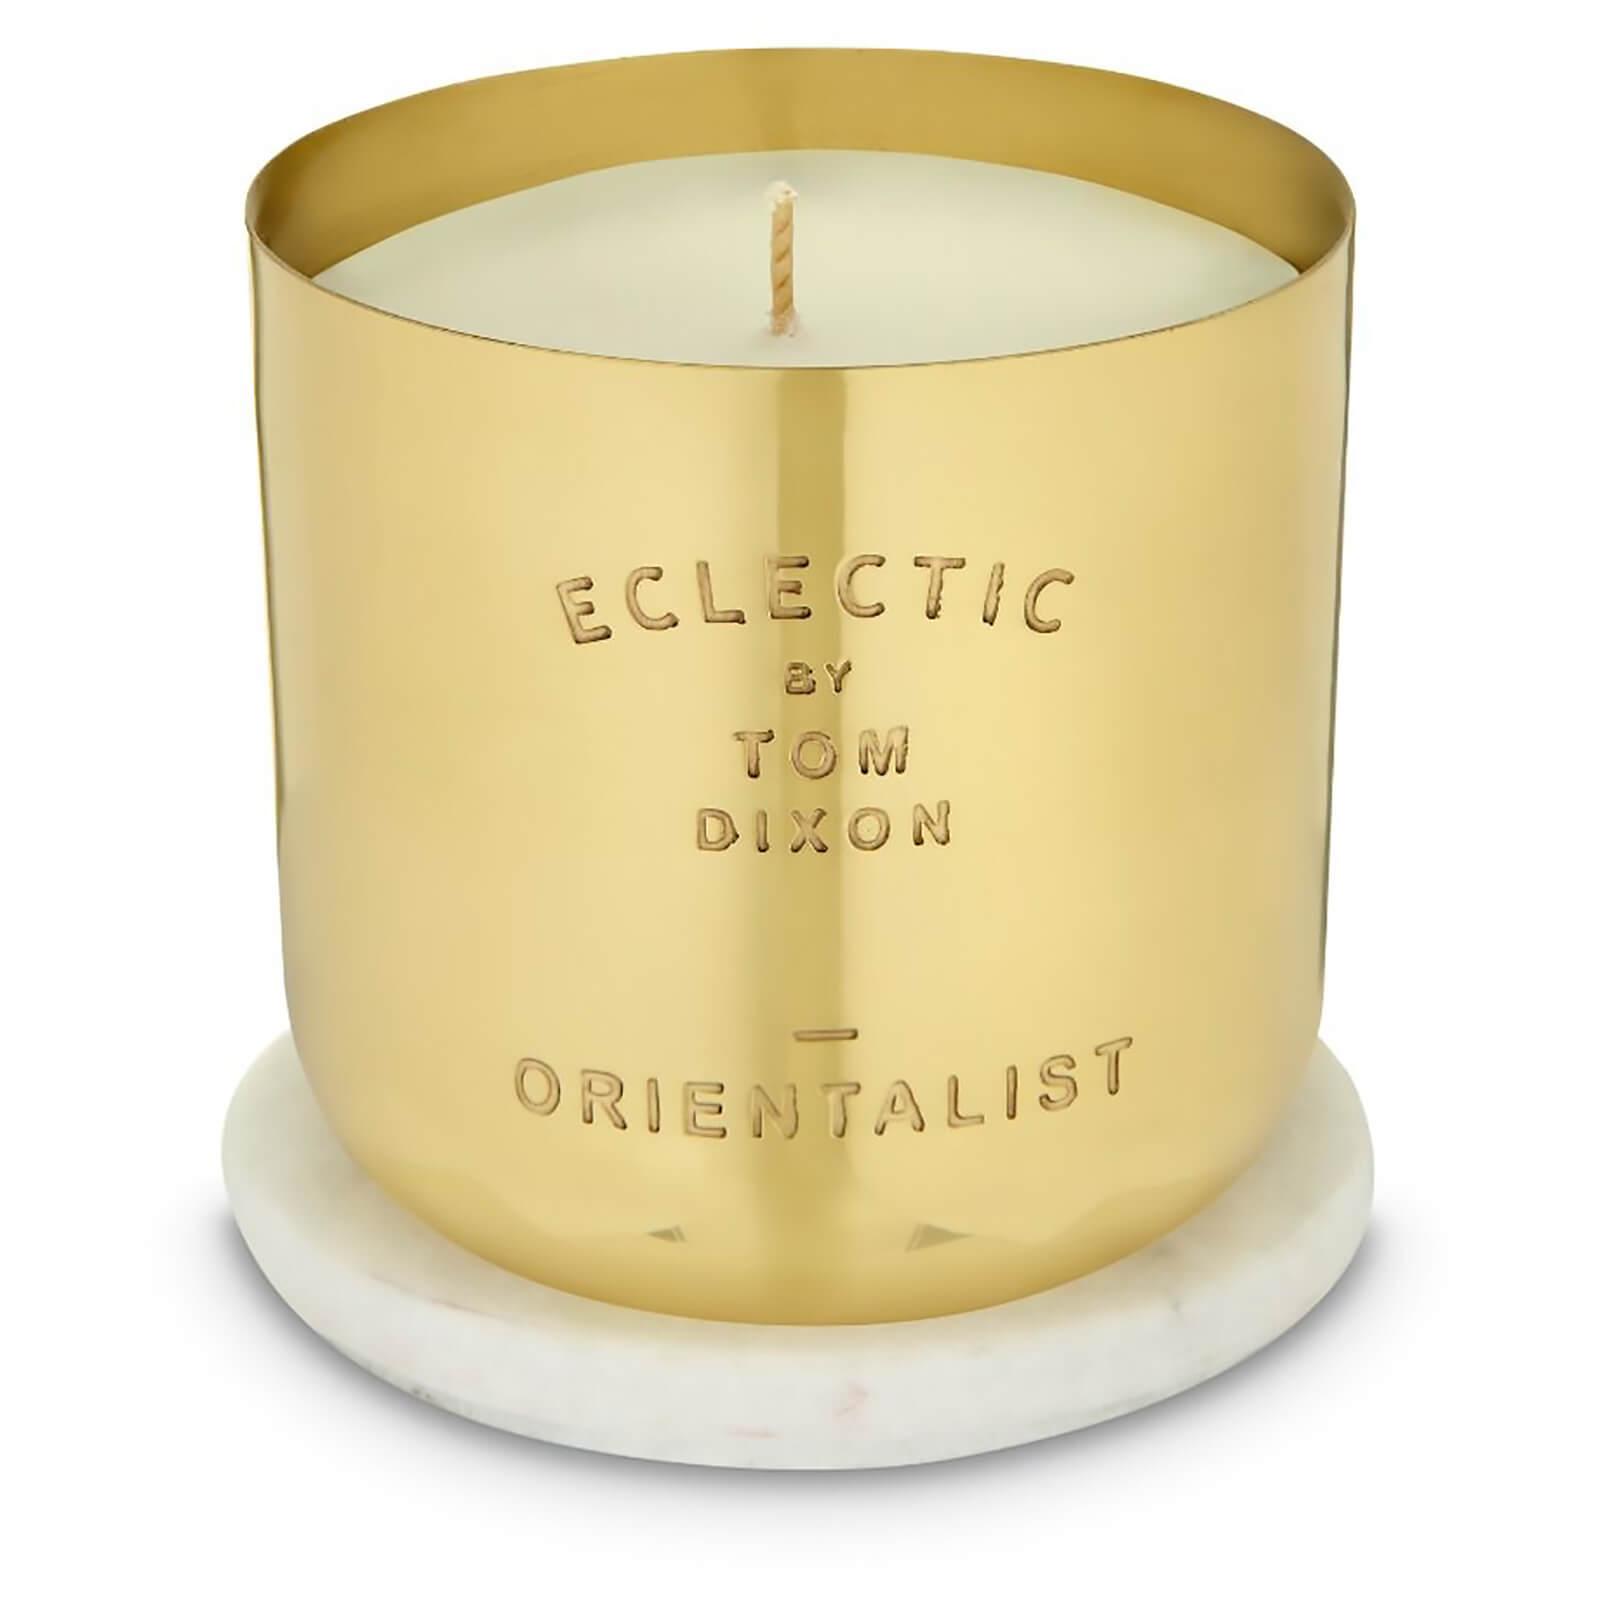 Tom Dixon Scented Candle - Orientalist